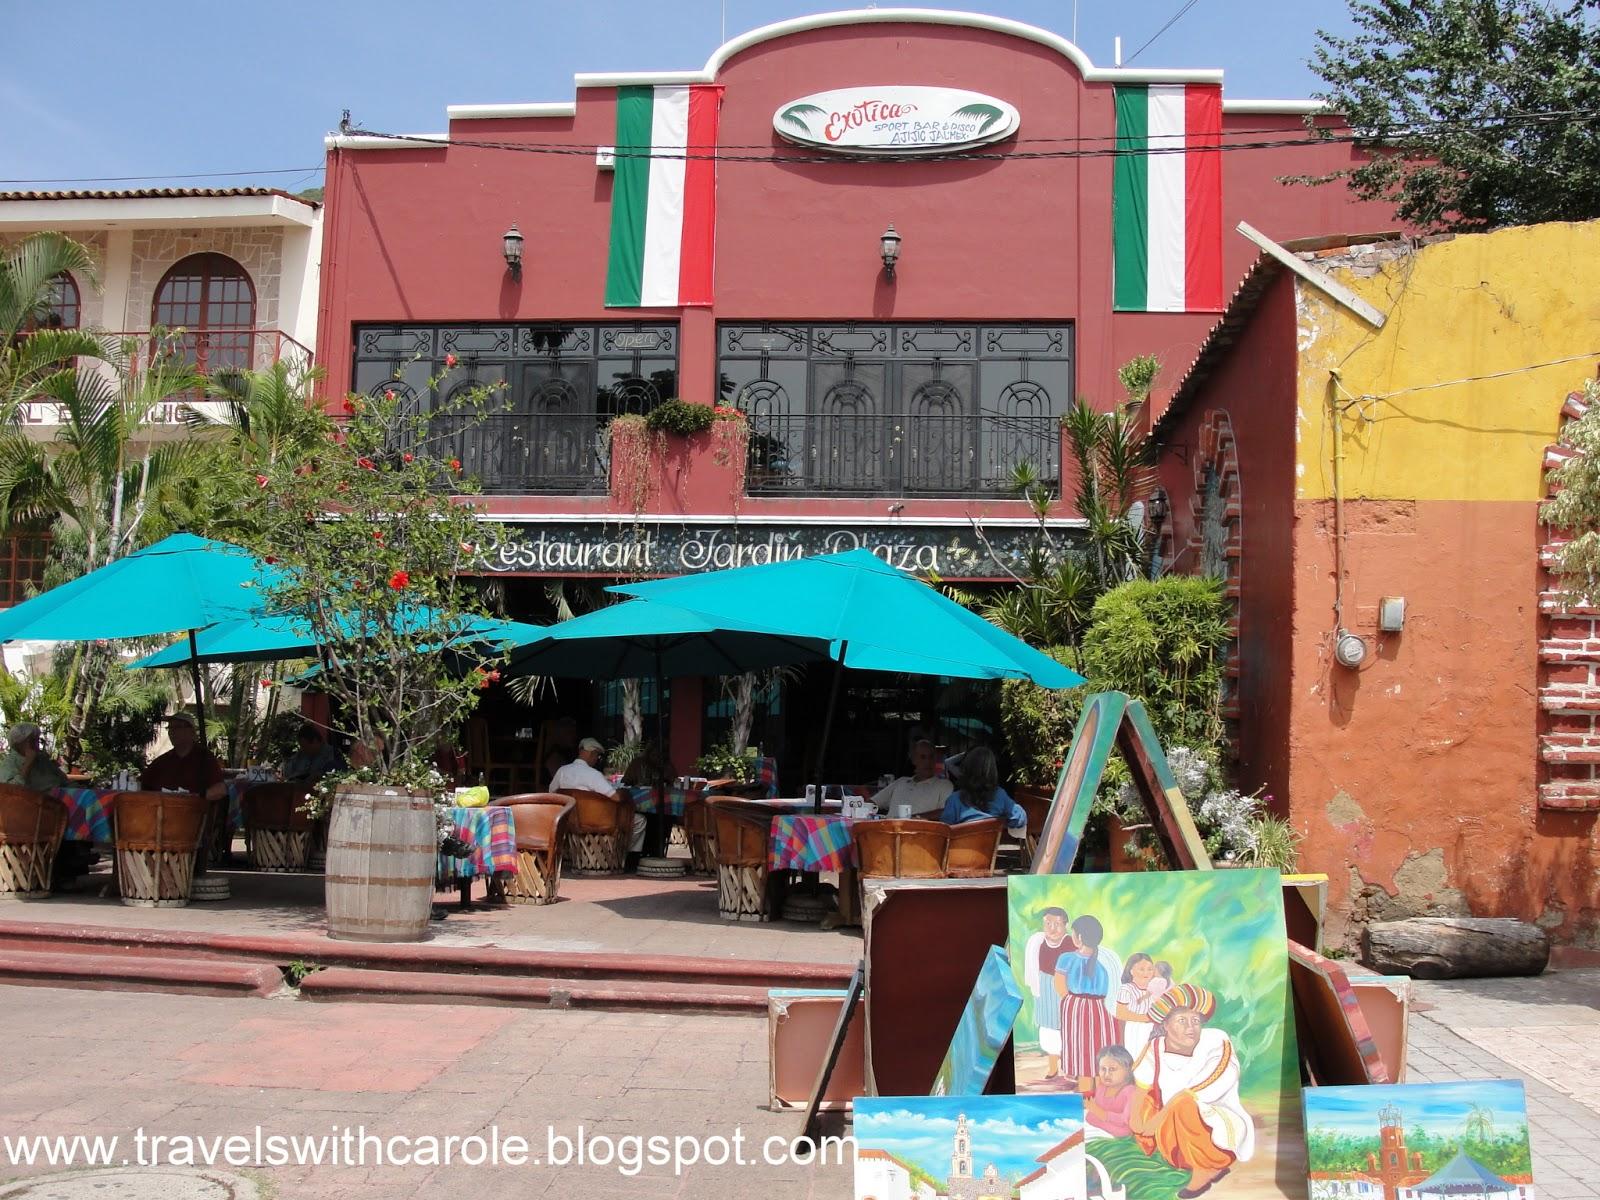 Travels with carole good eats jardin plaza ajijic mexico for Jardin plaza